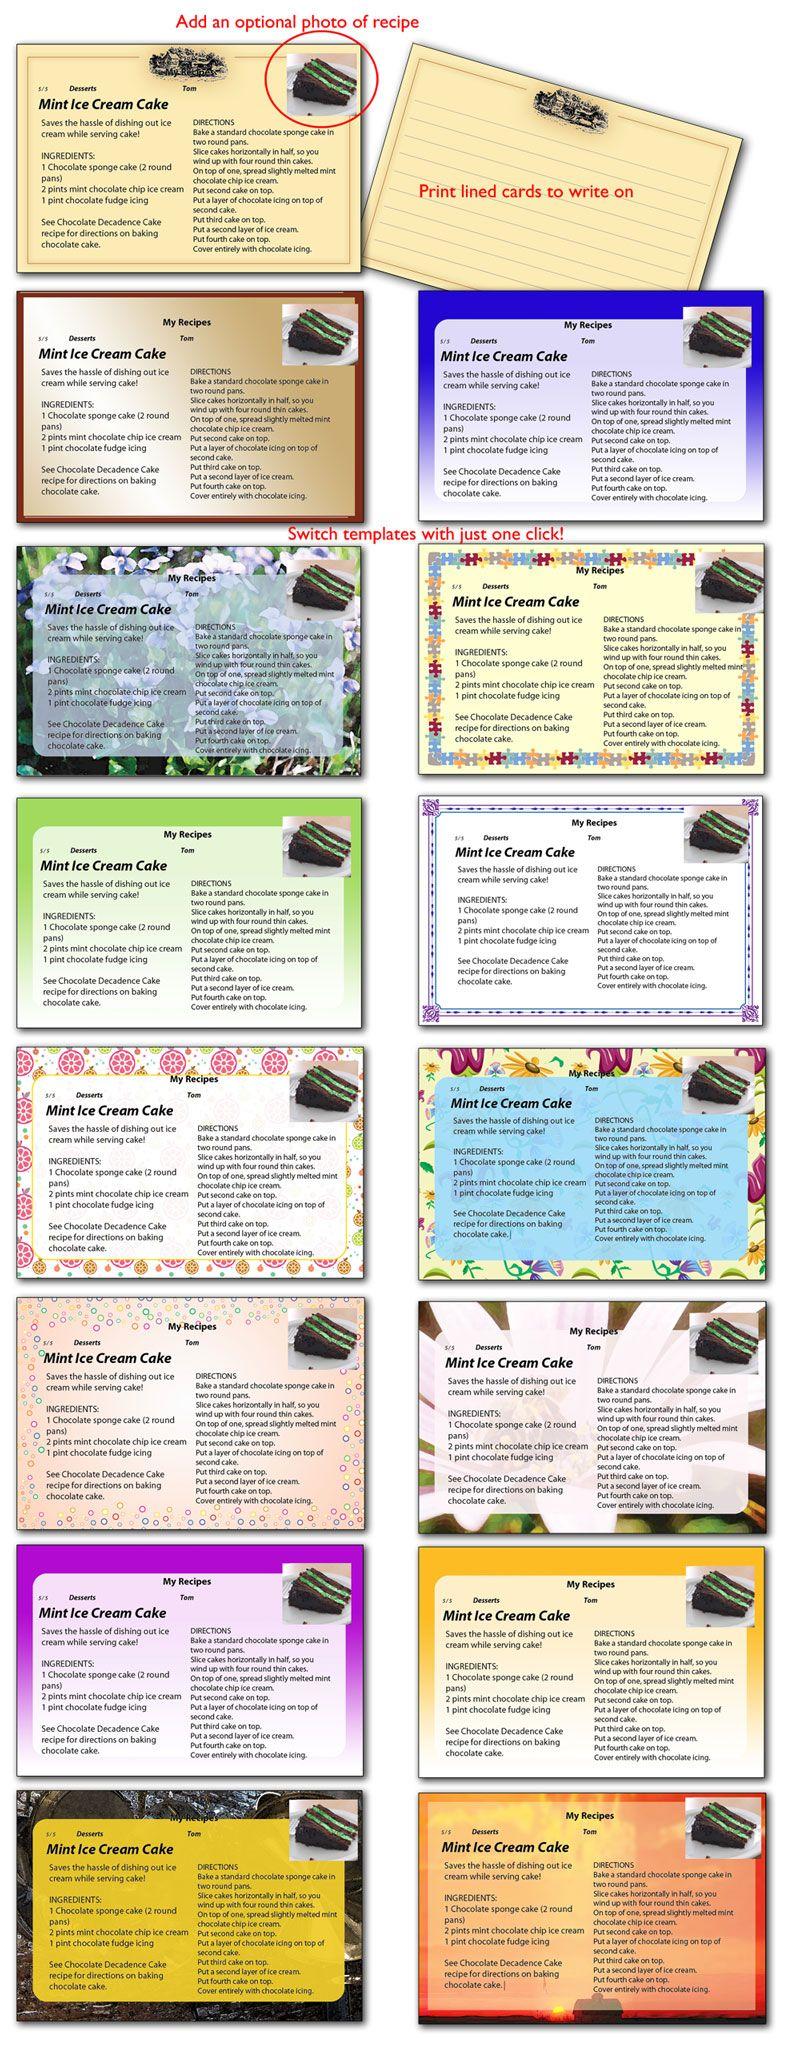 Card Templates Recipe Cards Template Recipe Cards Printable Recipe Cards